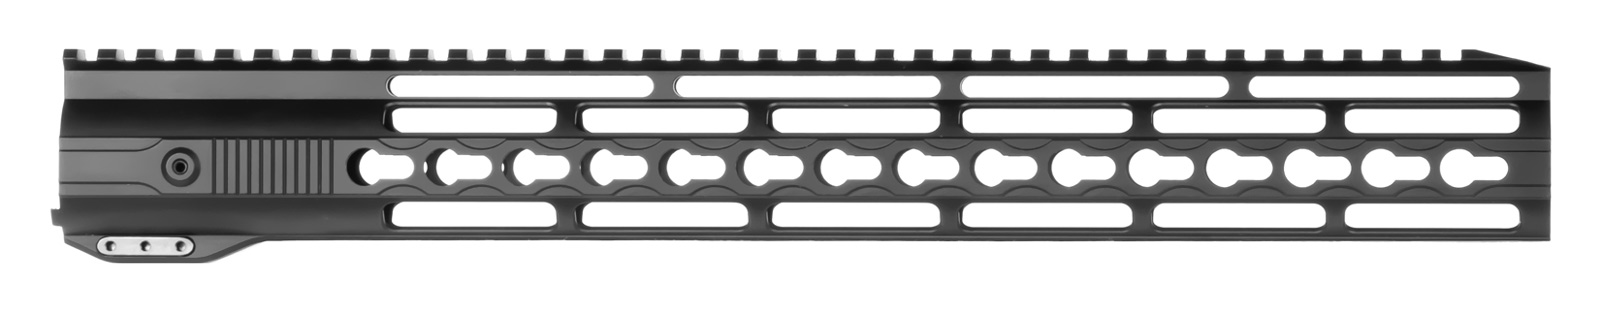 ar-15-rail-15-hera-arms-keymod-ar-15-handguard-rail-unmarked